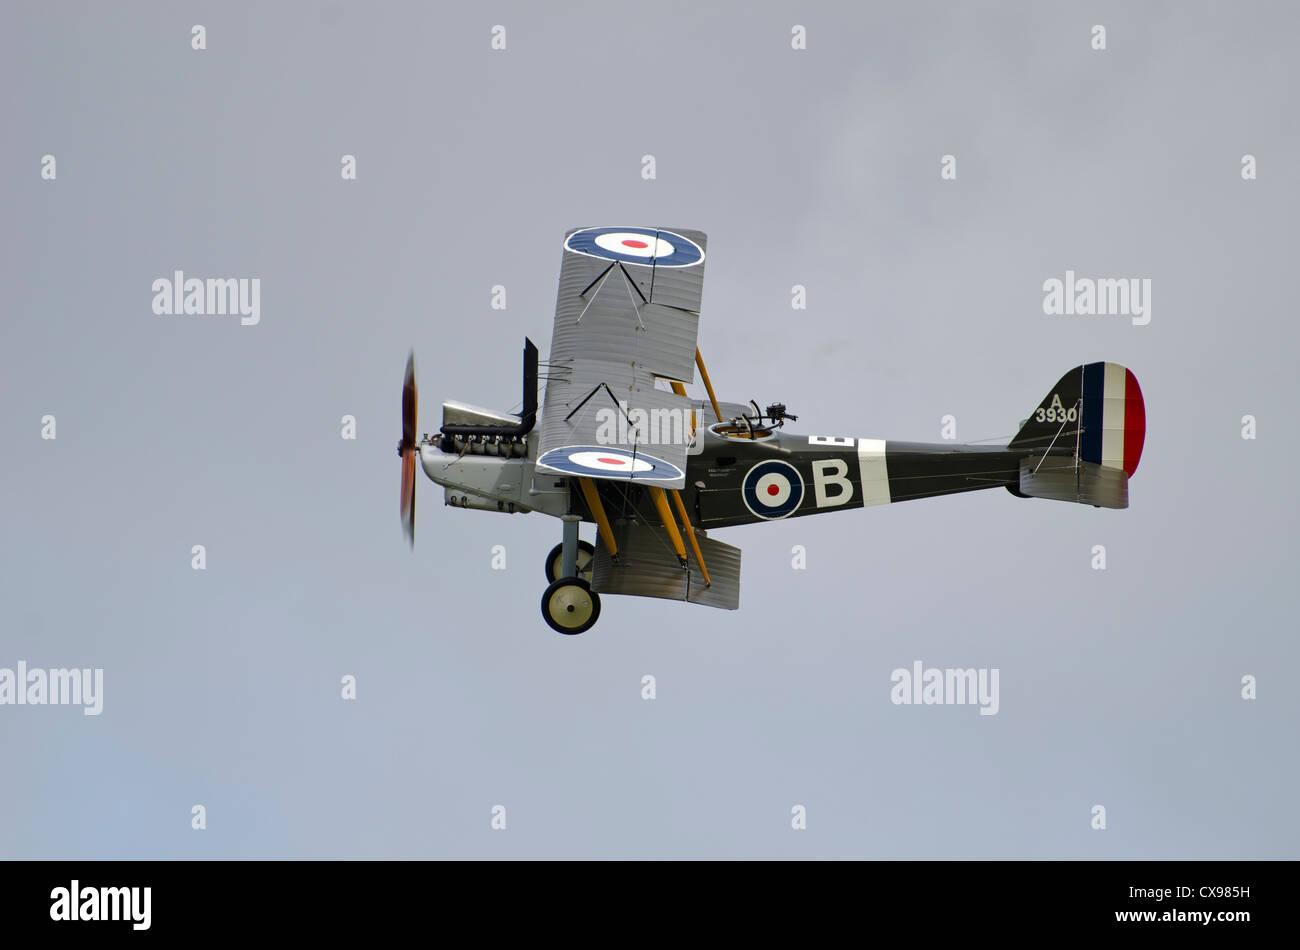 RE8 first world war bi-plane for hendon museum london - Stock Image